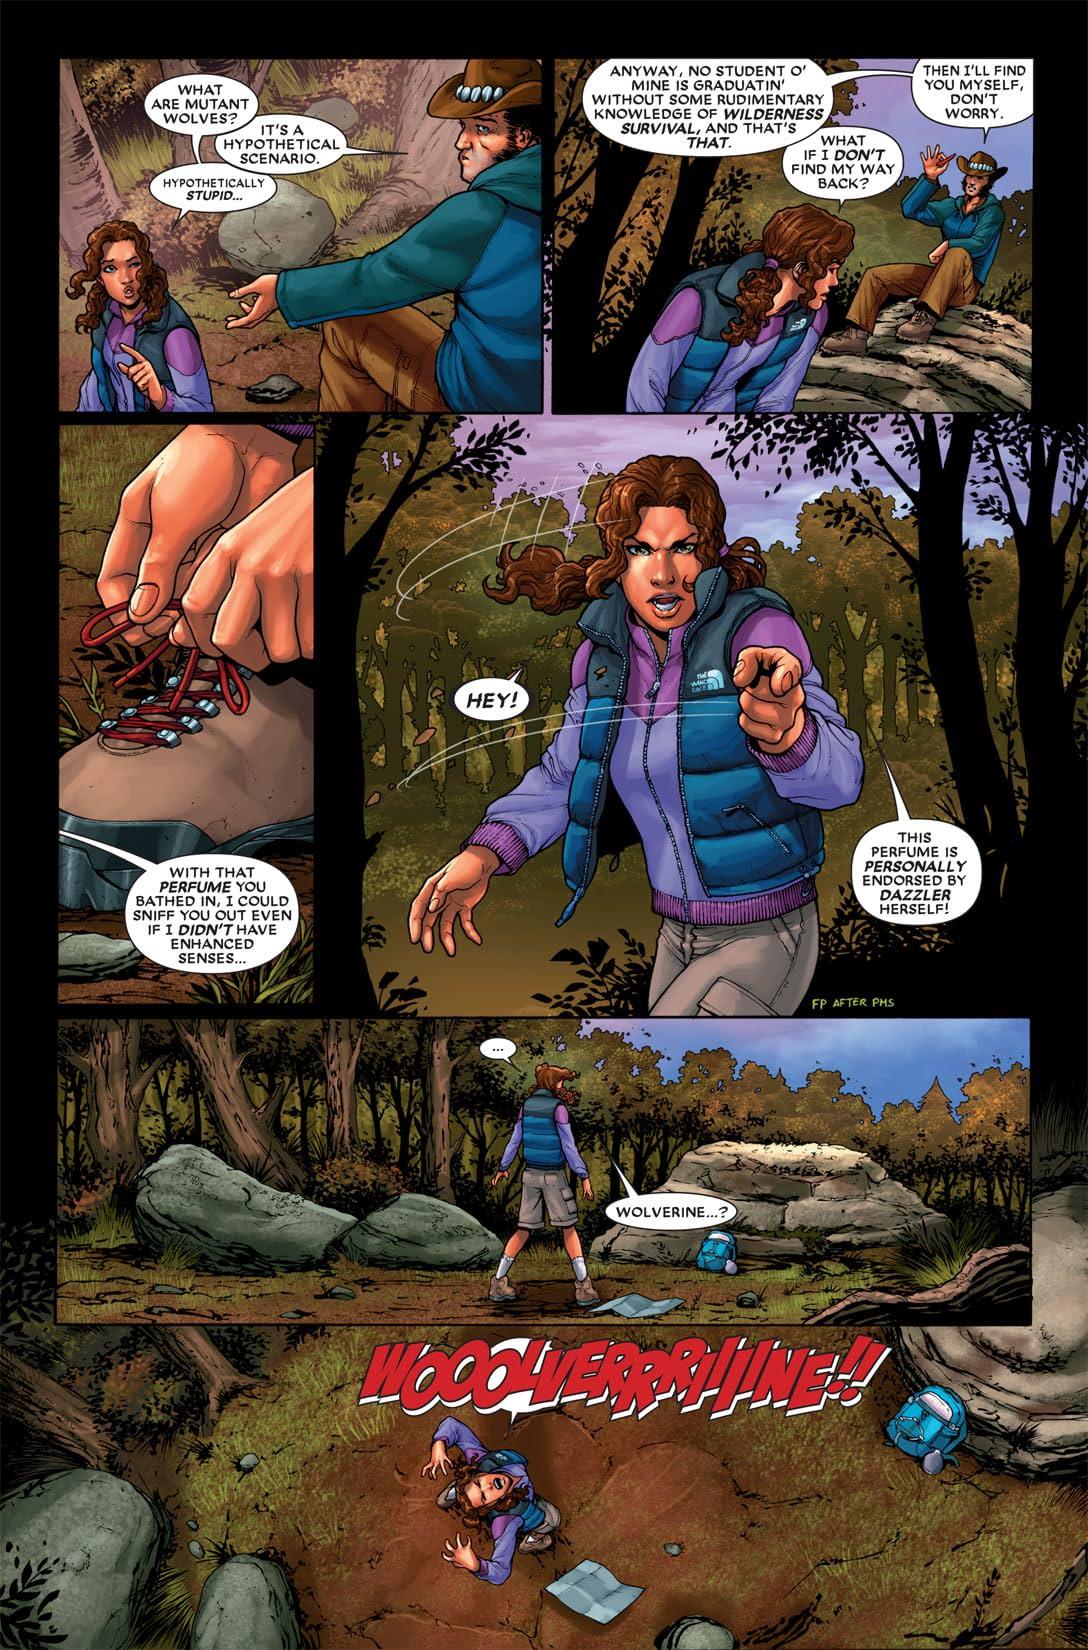 Wolverine: First Class #10